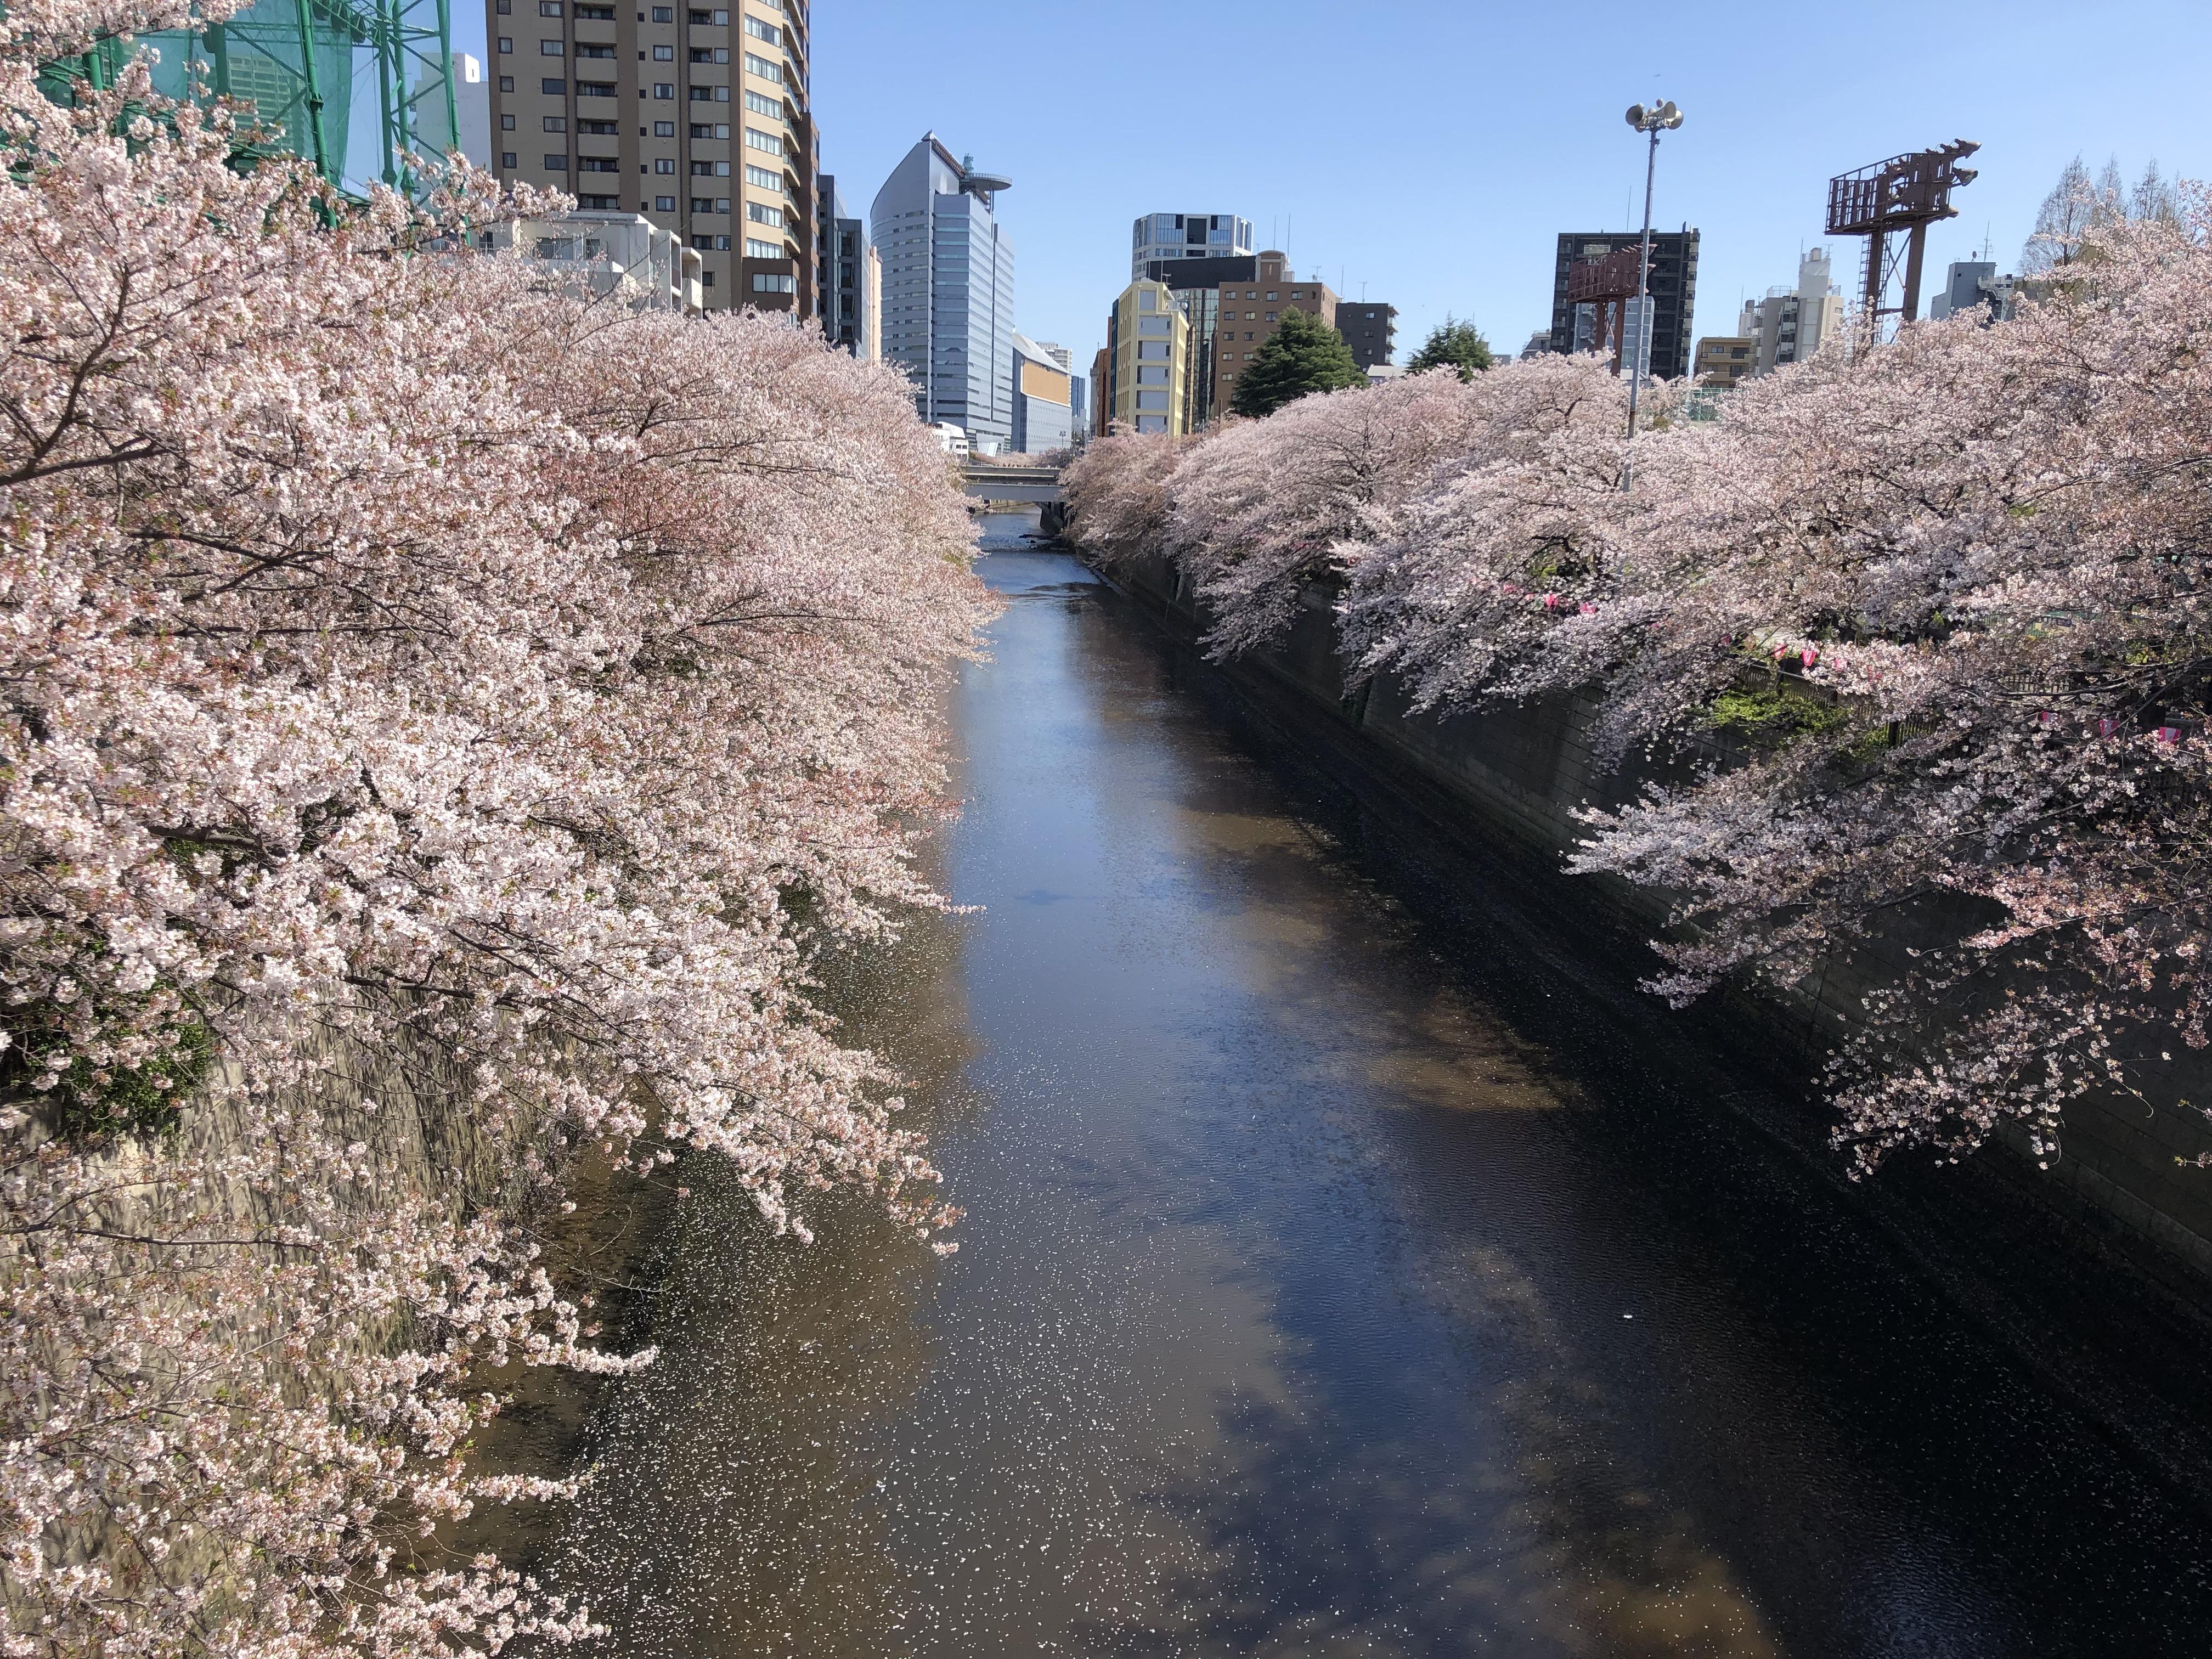 Meguro River during sakura season